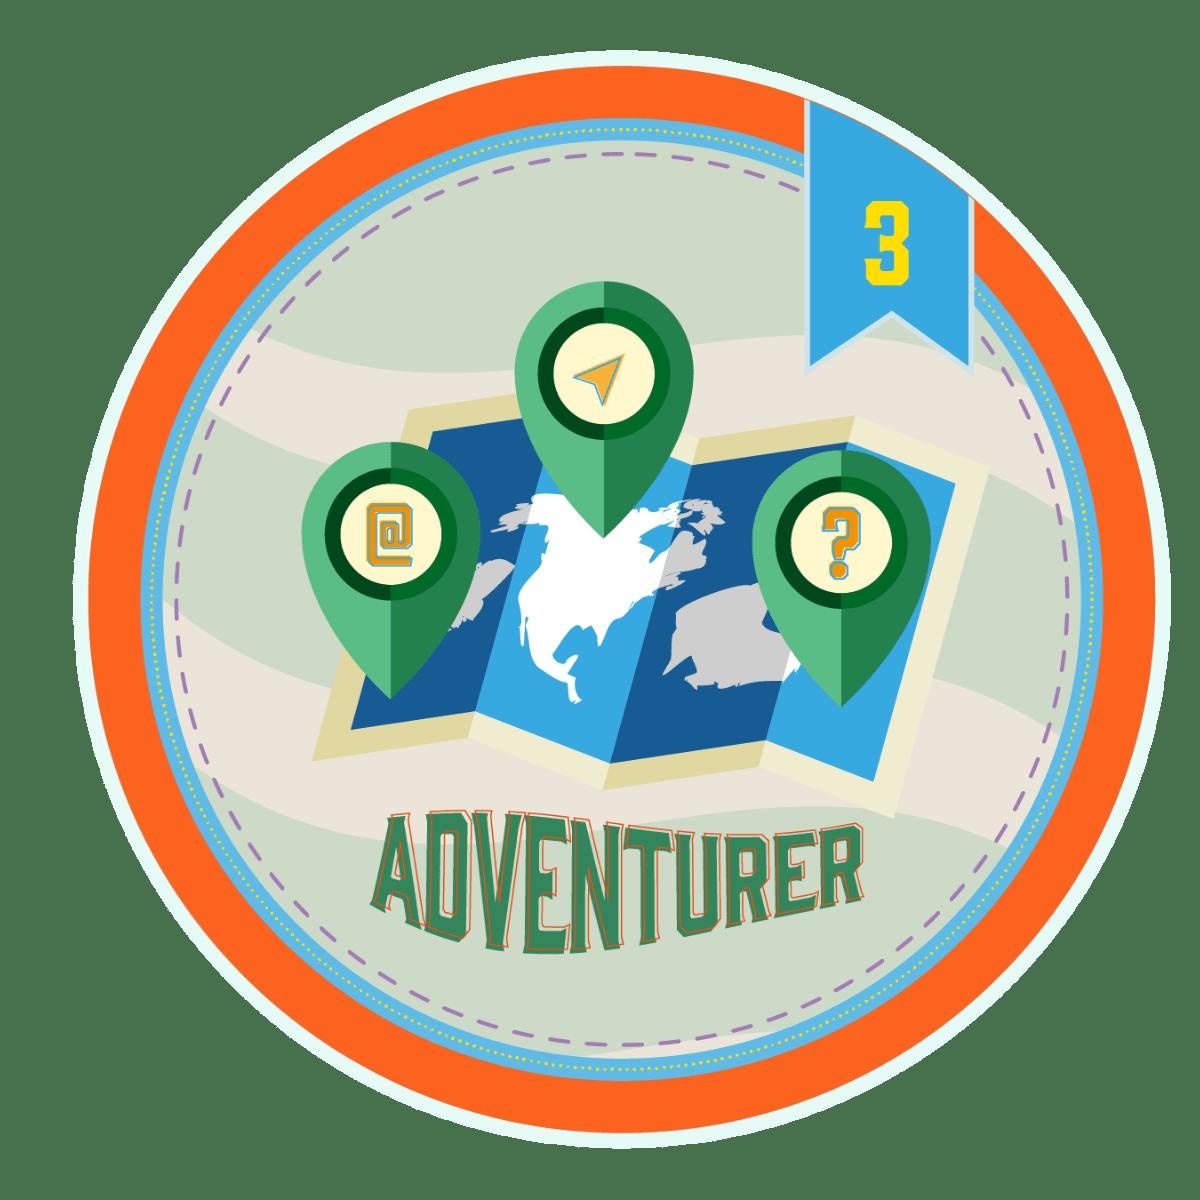 Adventurer Level 3